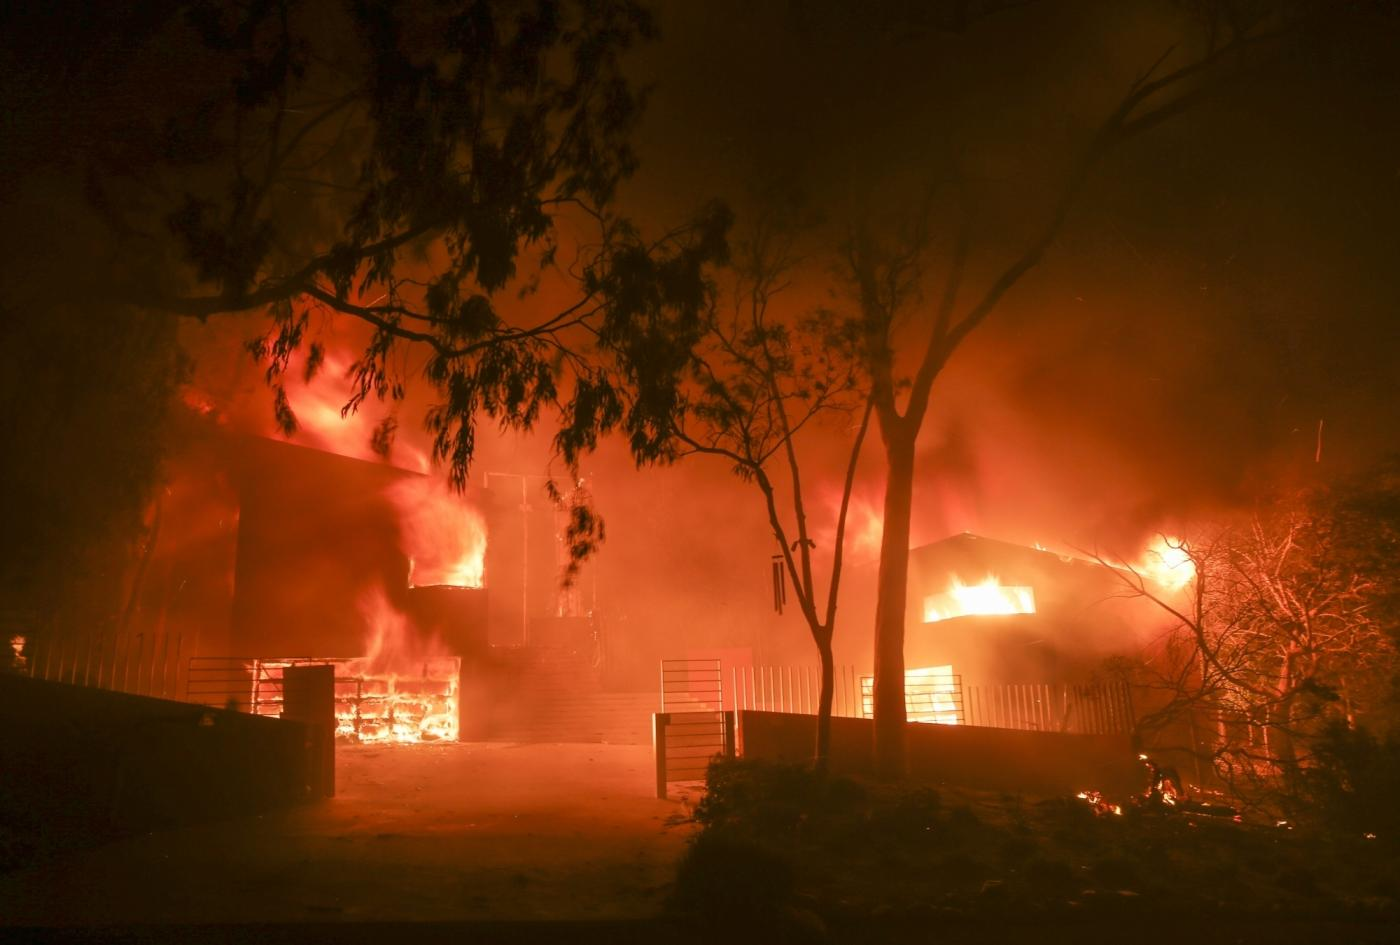 MALIBU, Nov. 10, 2018 (Xinhua) -- Wildfire burns a house in Malibu, California, the United States, on Nov. 9, 2018. (Xinhua/Zhao Hanrong/IANS) by .